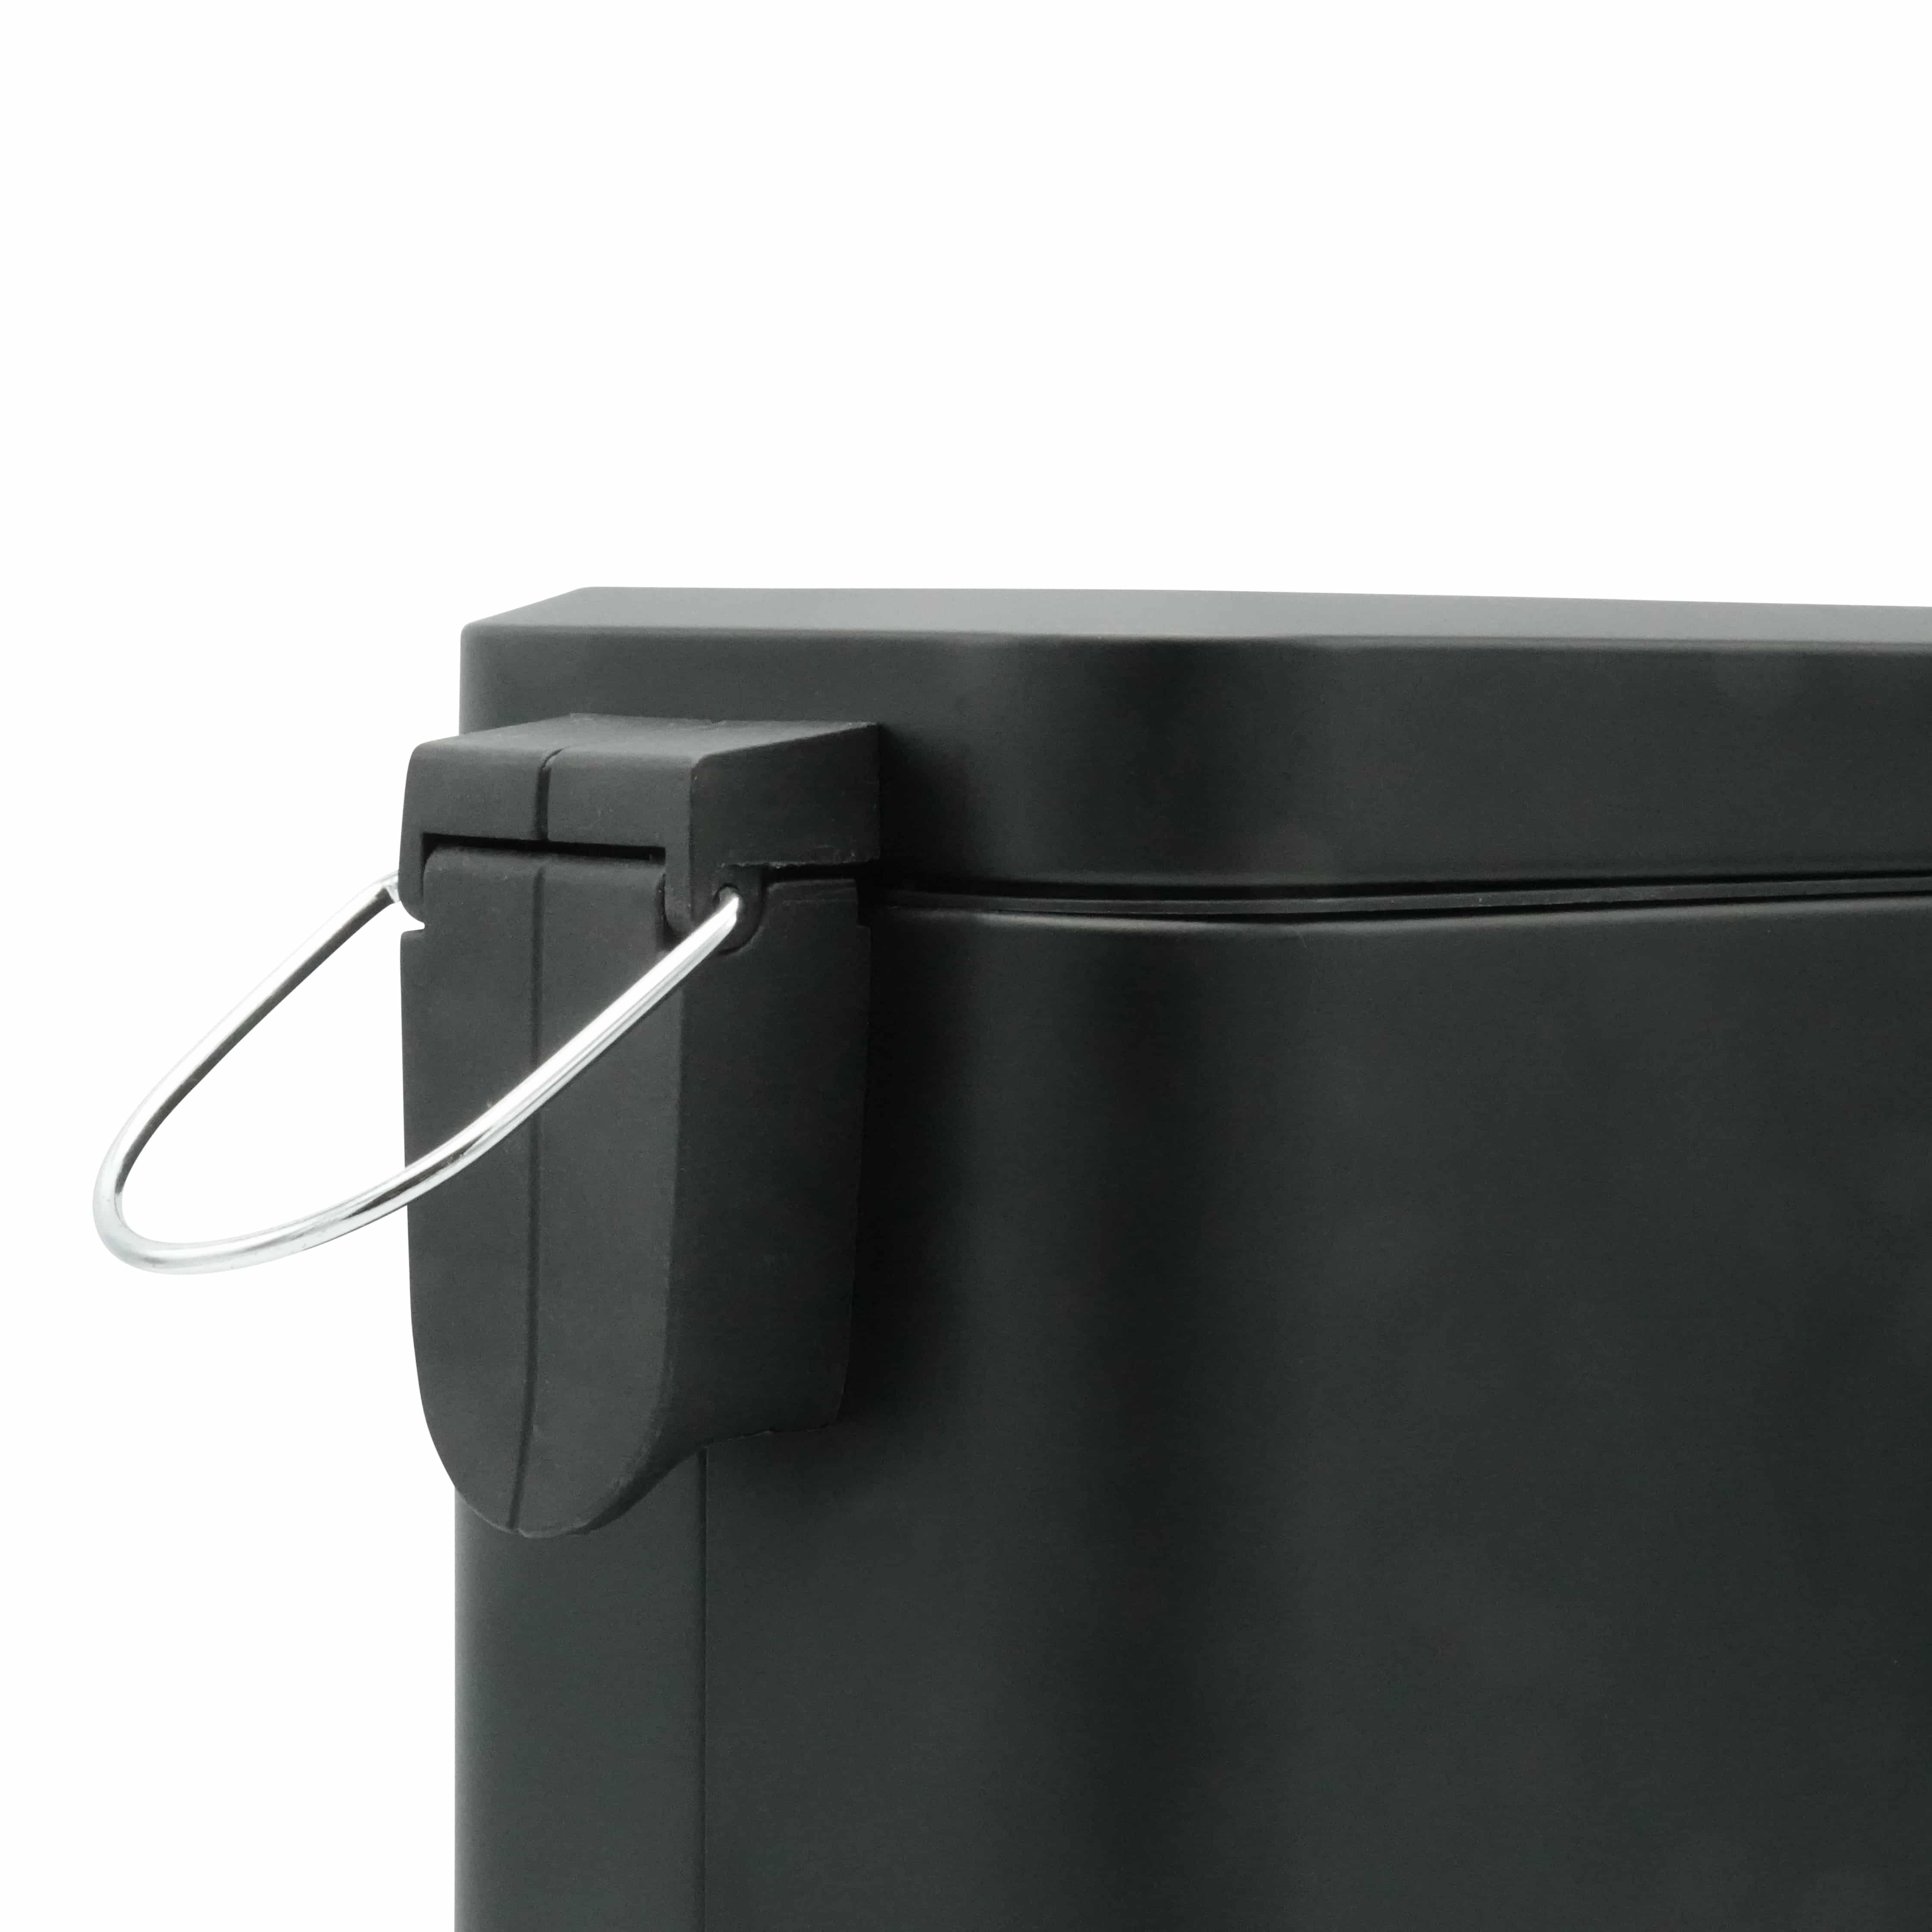 4goodz rechthoekige metalen pedaalemmer 5 liter - 14x28x30 cm - Zwart